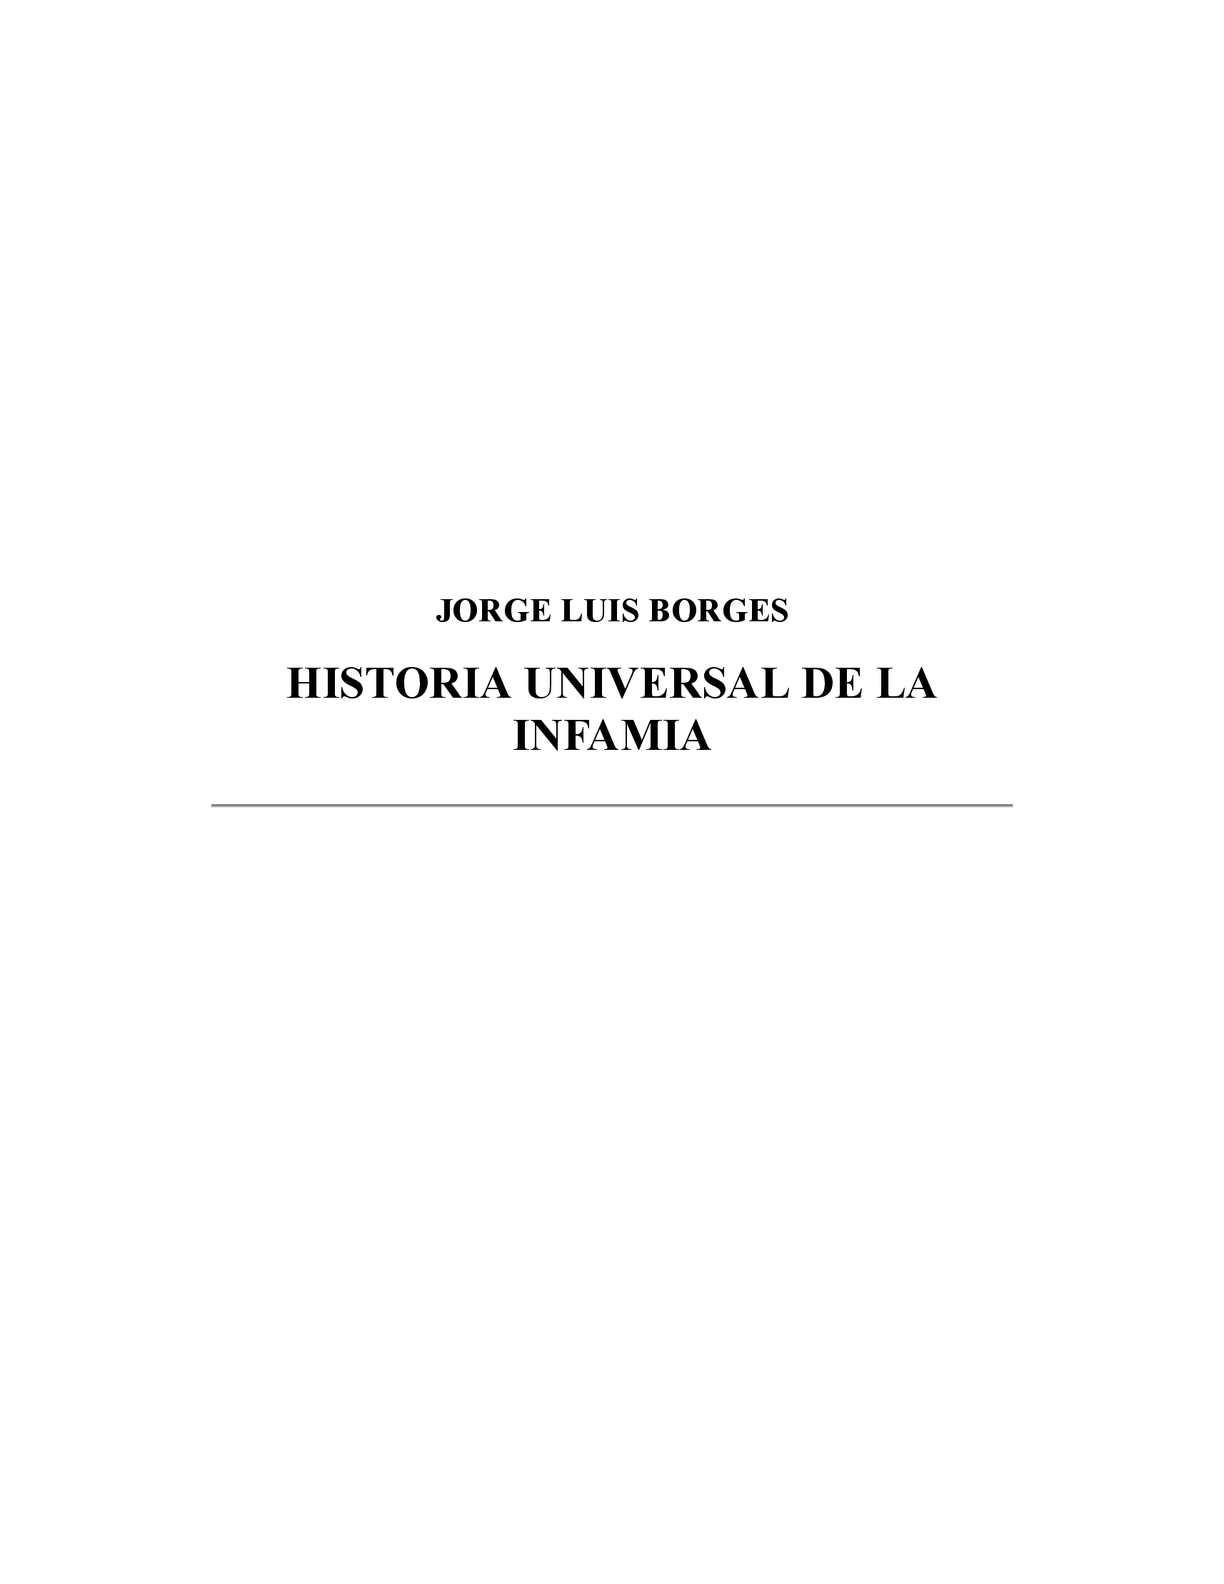 Calaméo - Historia universal de la infamia